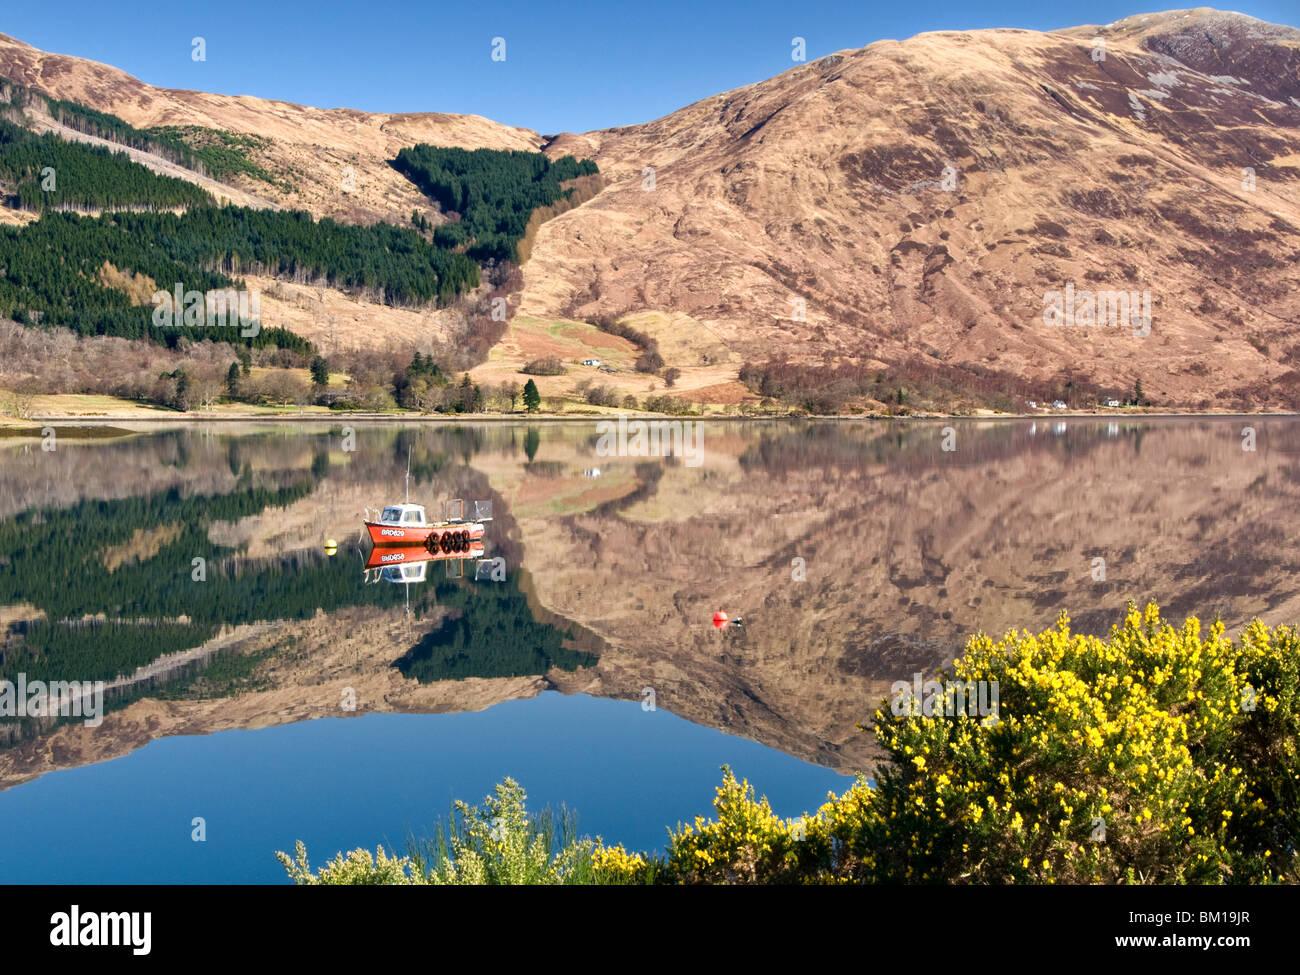 Reflections in Loch Leven, Near Ballachulish, Glencoe, Scottish Highlands, Scotland, UK - Stock Image